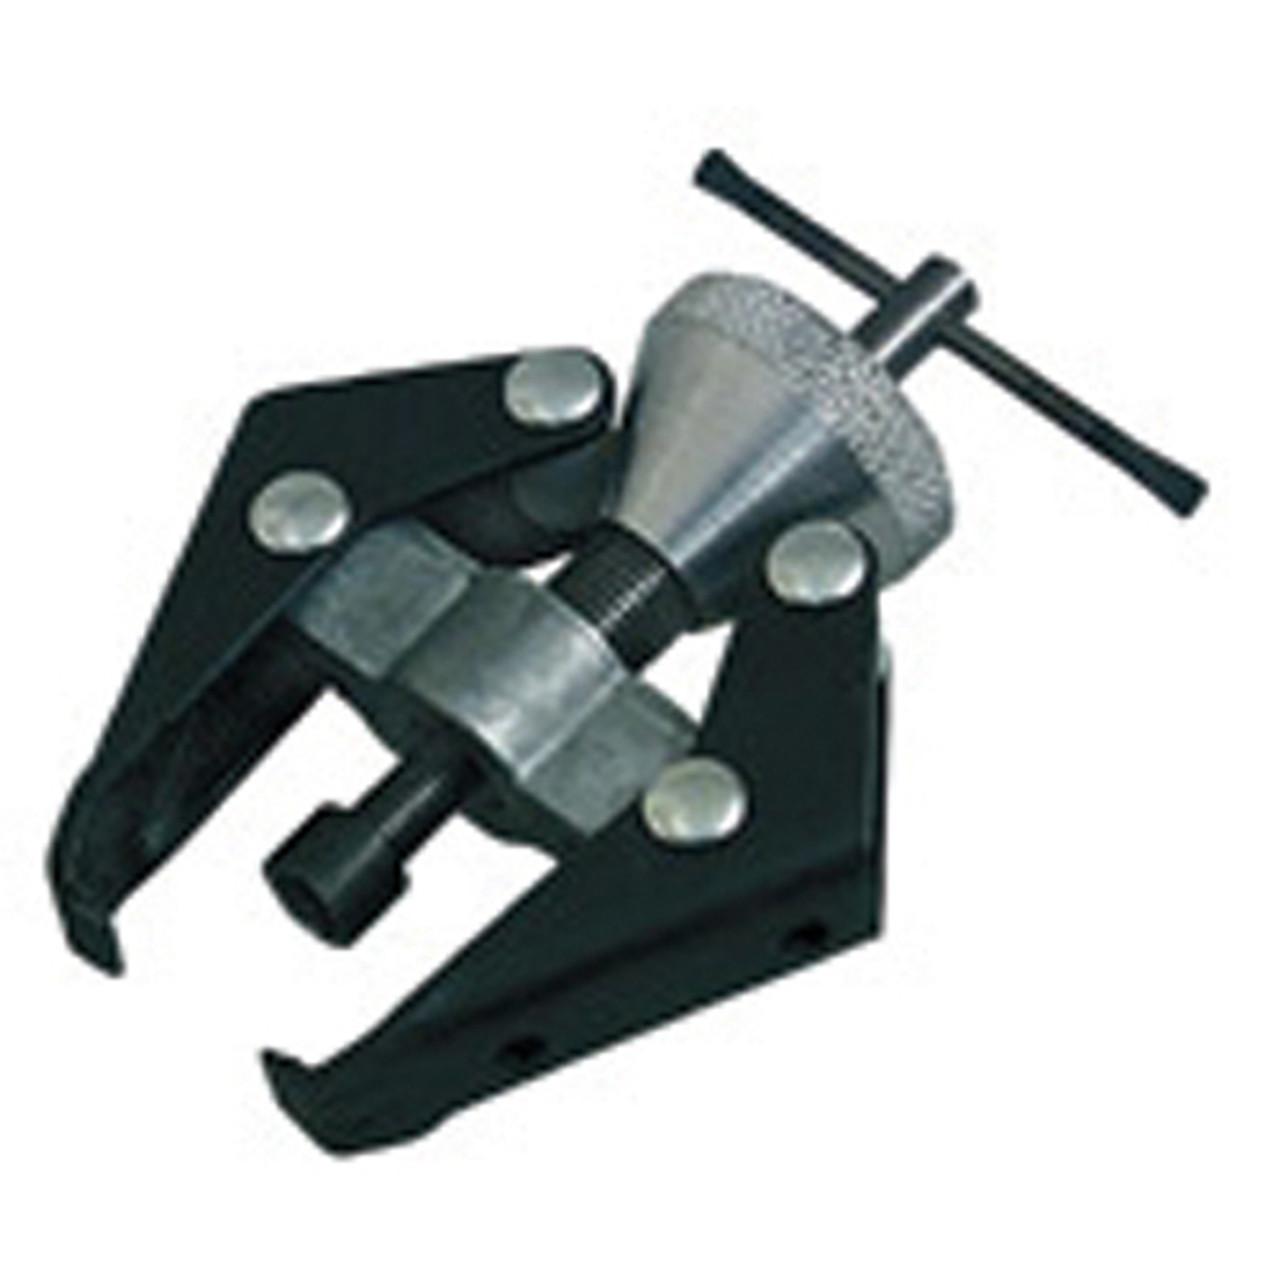 CTA Tools 5250 Windshield Wiper Arm Puller